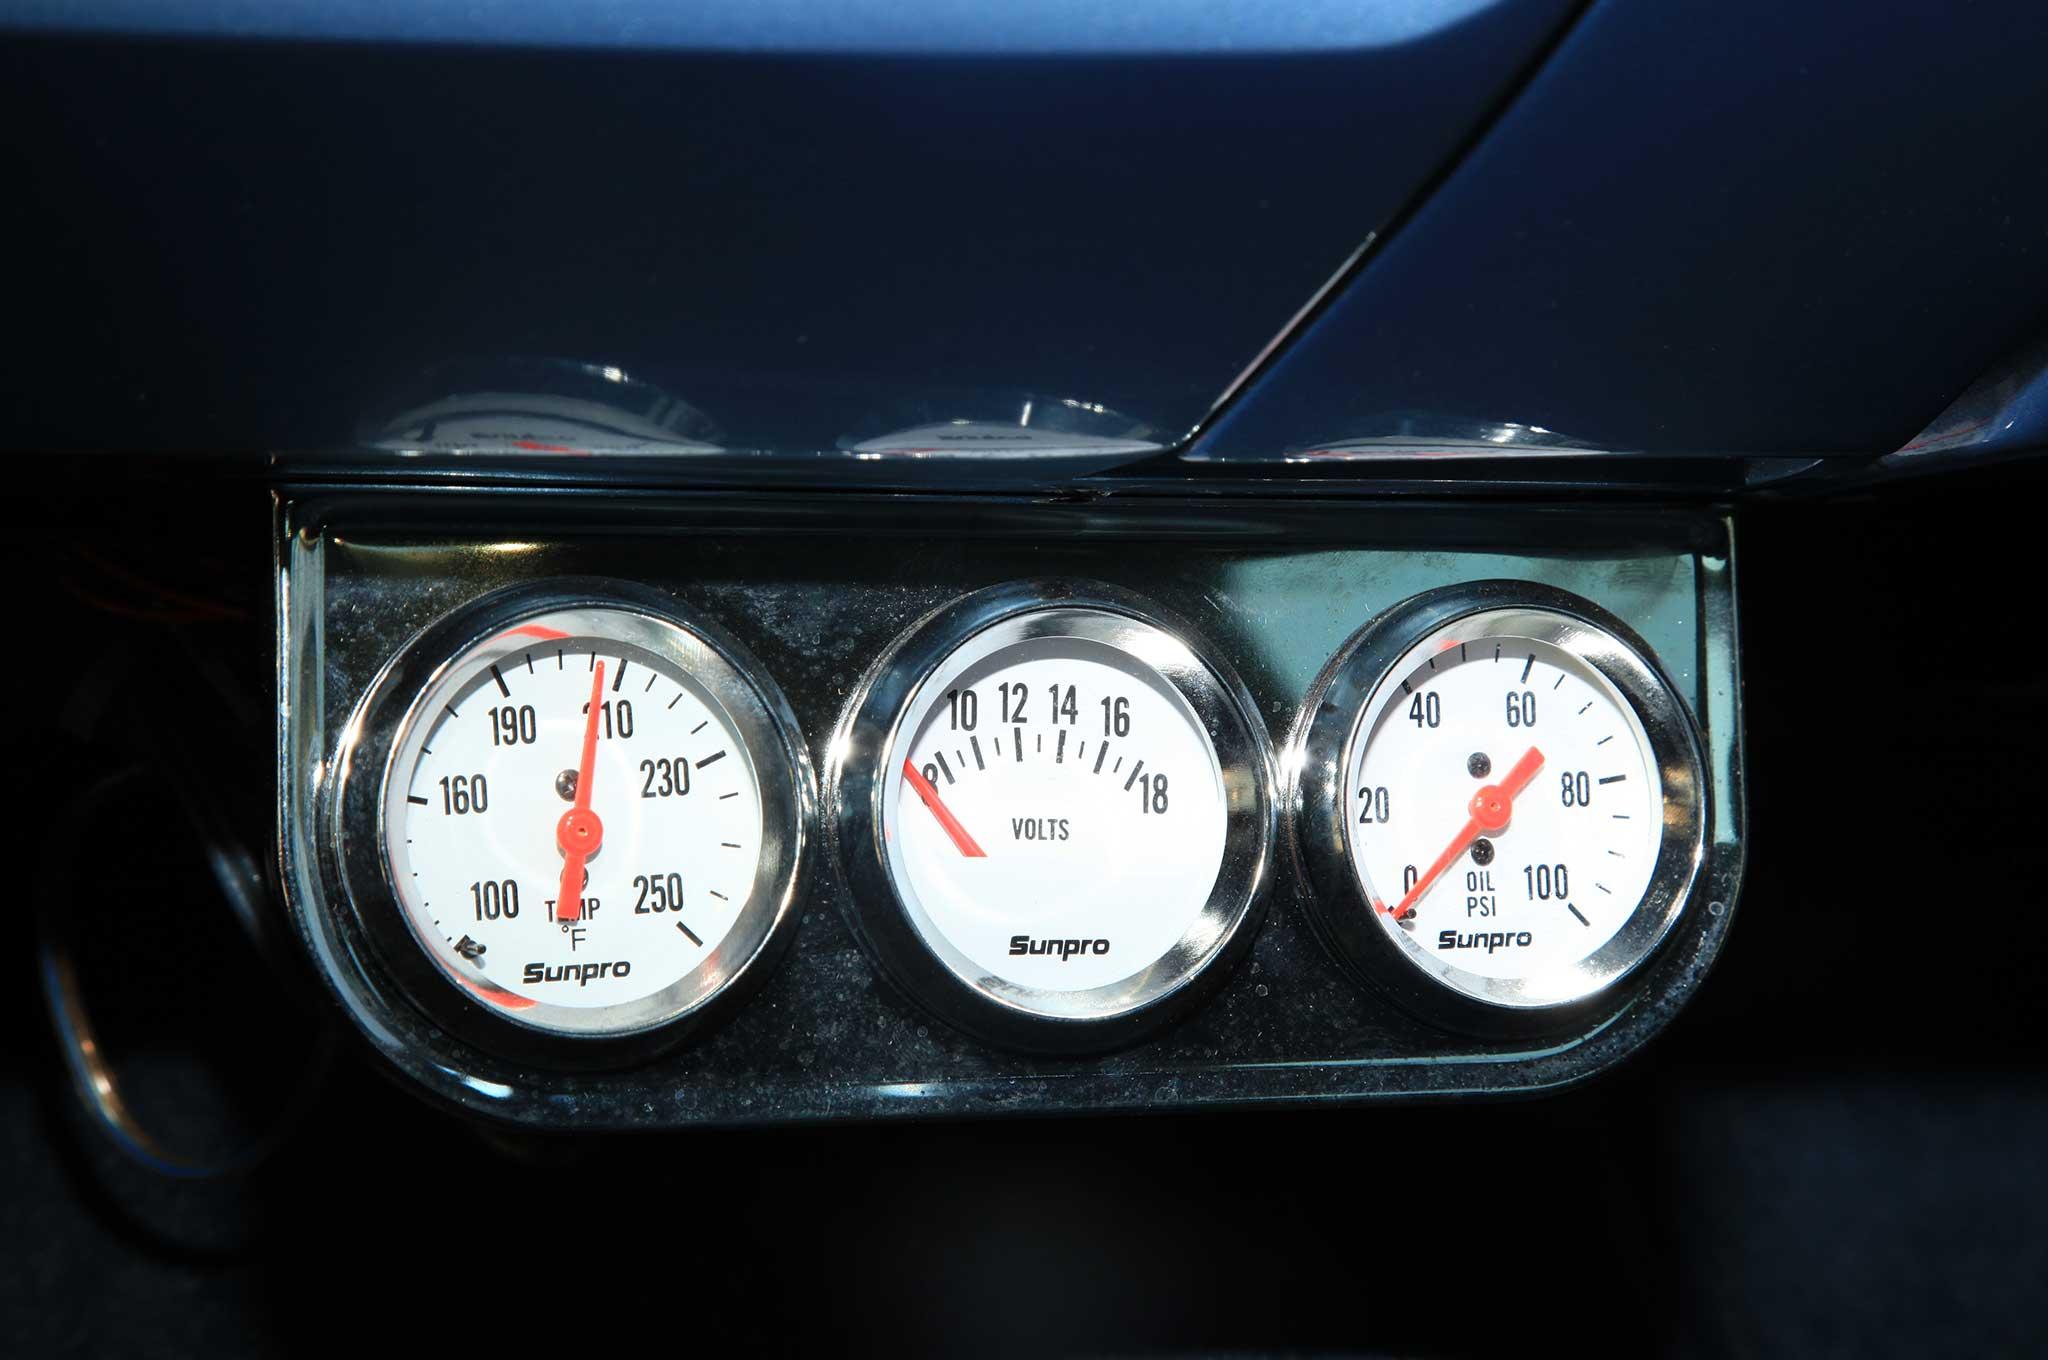 Sunpro Volt Gauge Oldsmobile Alero Gauges Wiring Diagram Chevrolet Impala Lowrider 2048x1360